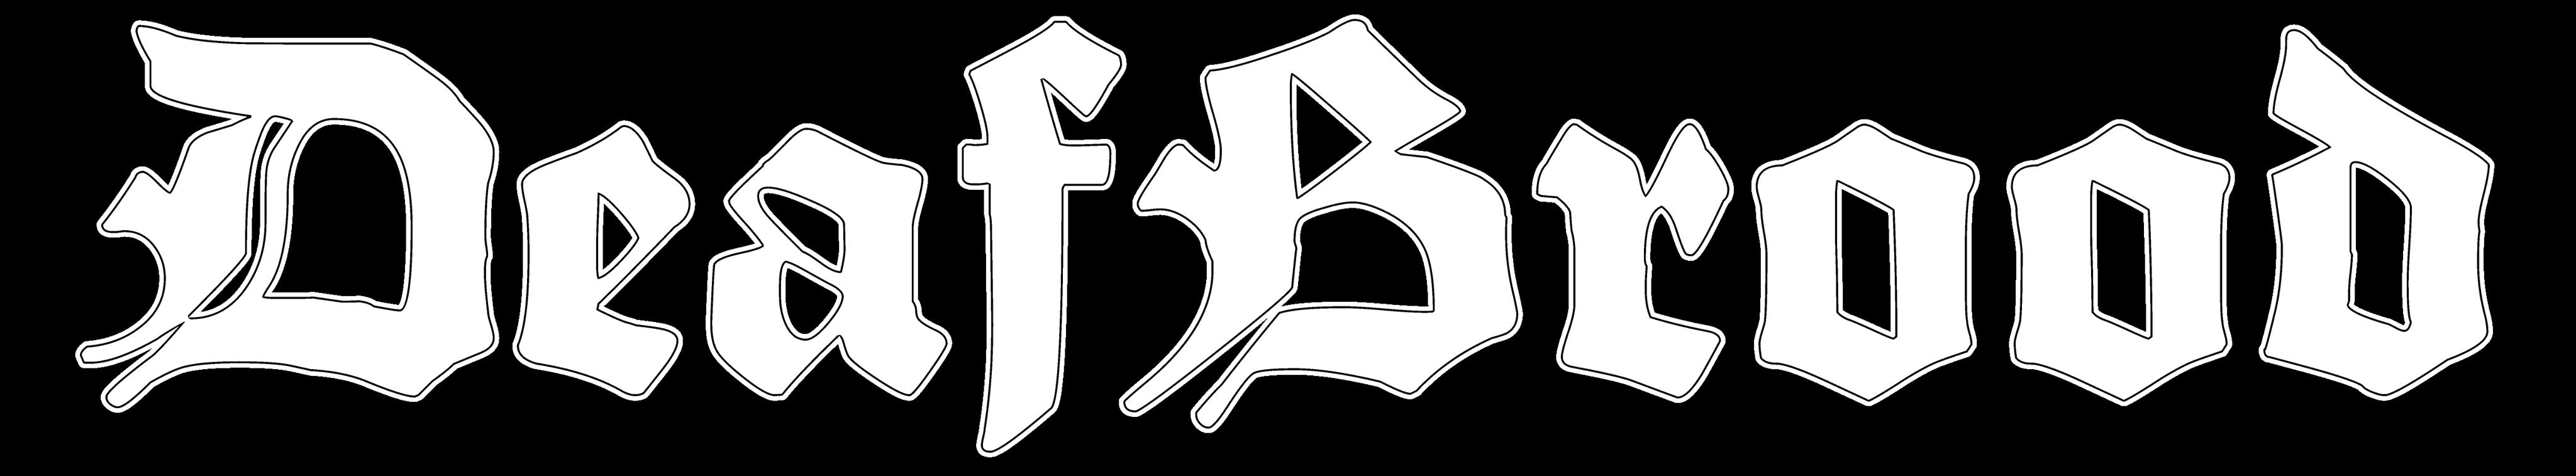 DeafBrood band logo white